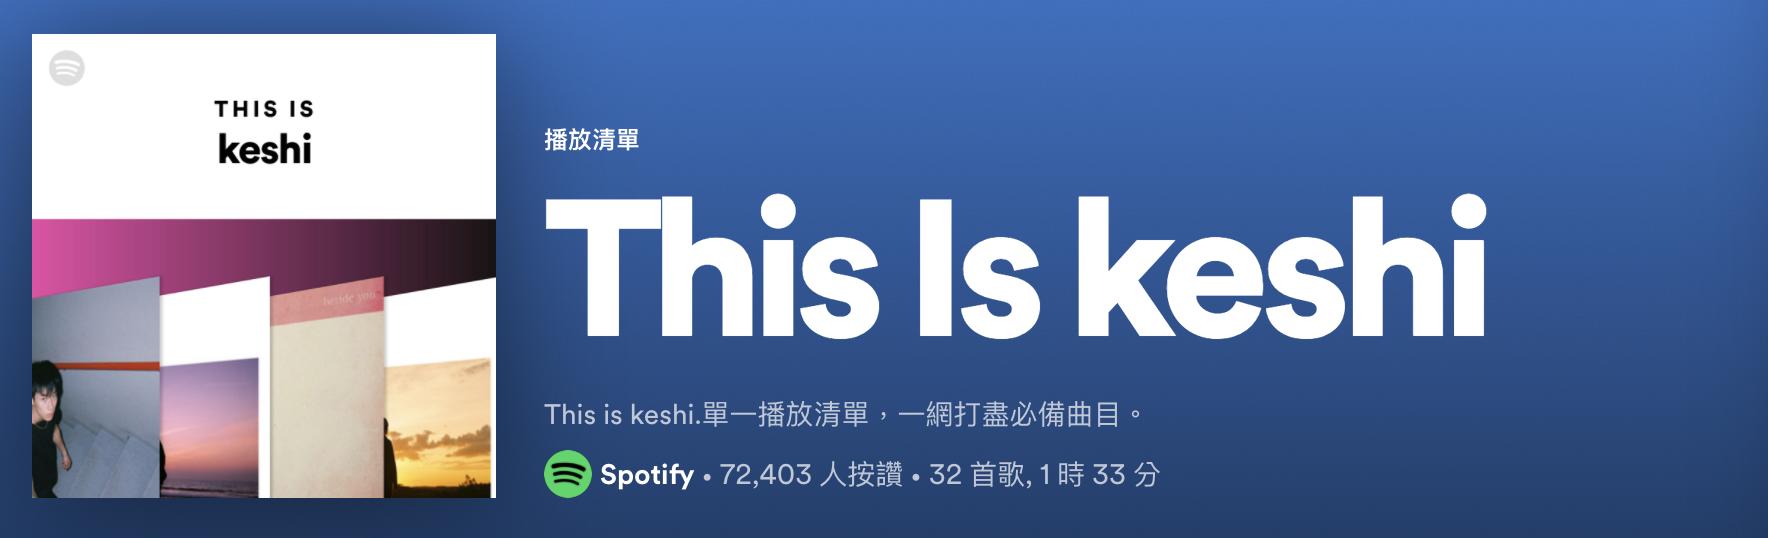 Keshi playlist